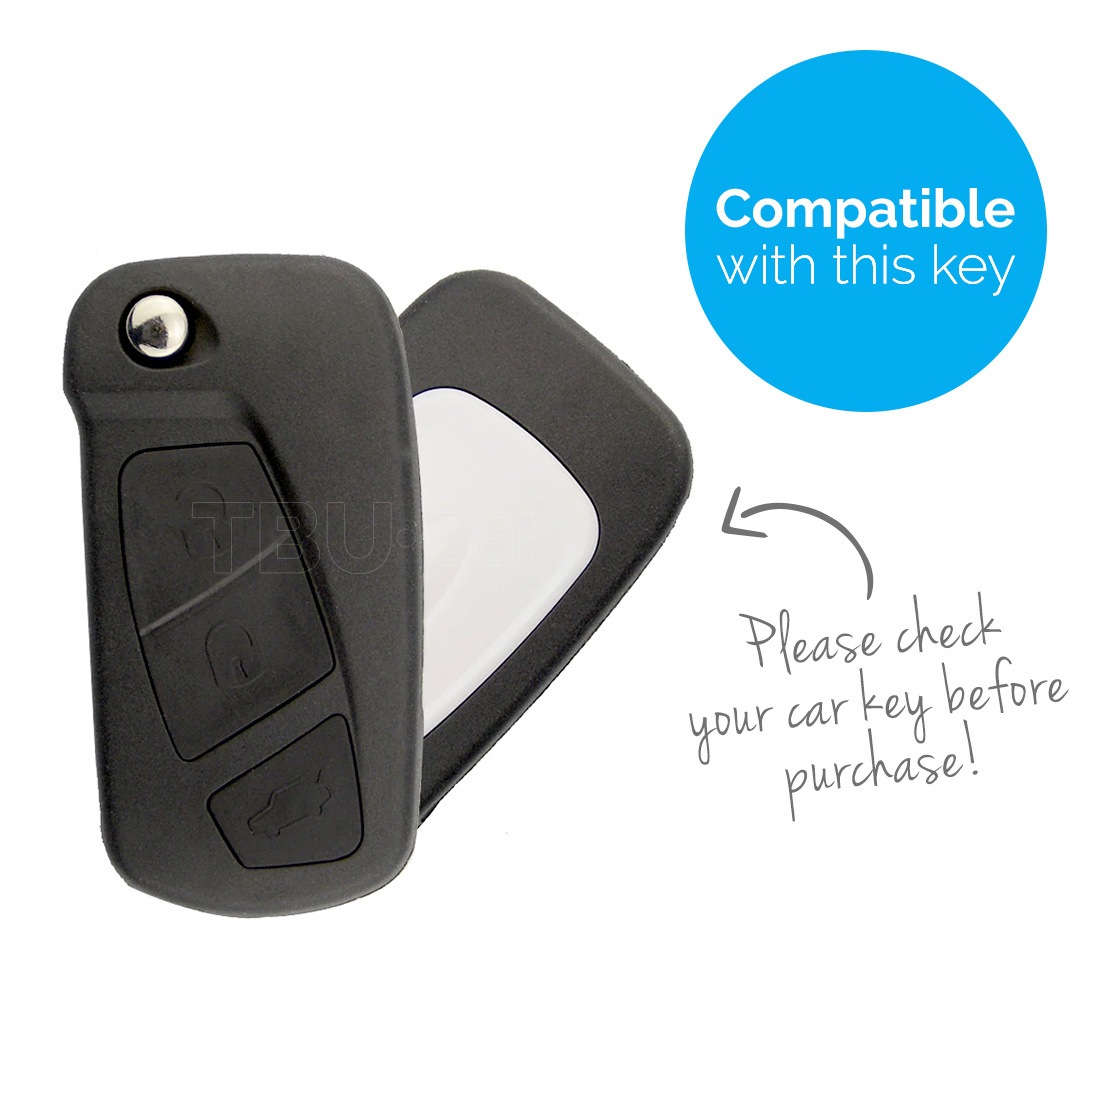 TBU car Autoschlüssel Hülle für Ford 3 Tasten (KA) - Schutzhülle aus Silikon - Auto Schlüsselhülle Cover in Violett